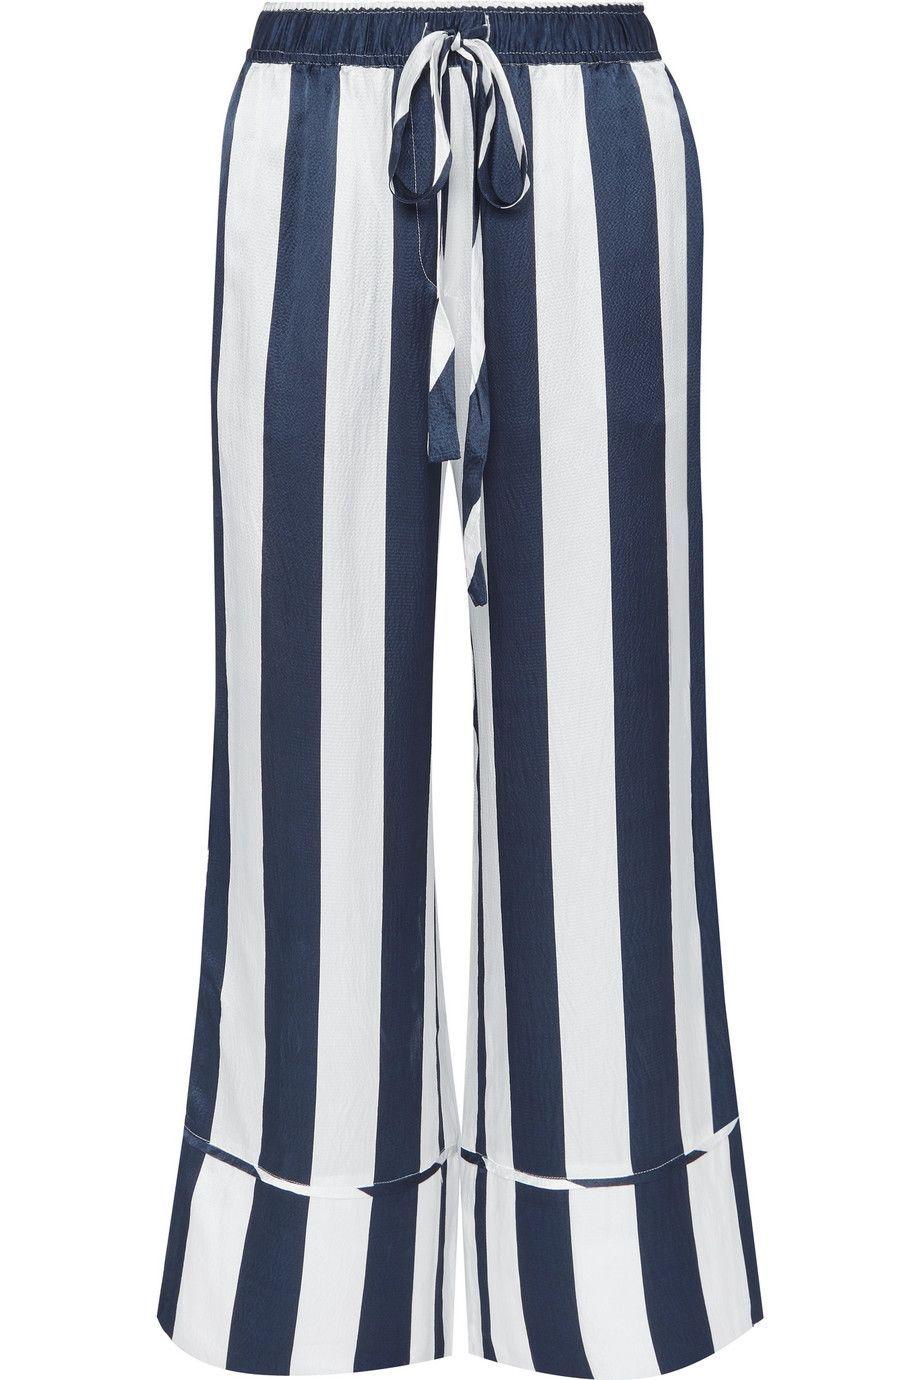 #PopbelaOOTD: Celana yang Buat Kamu Terlihat Tinggi (Plus Kurus!)